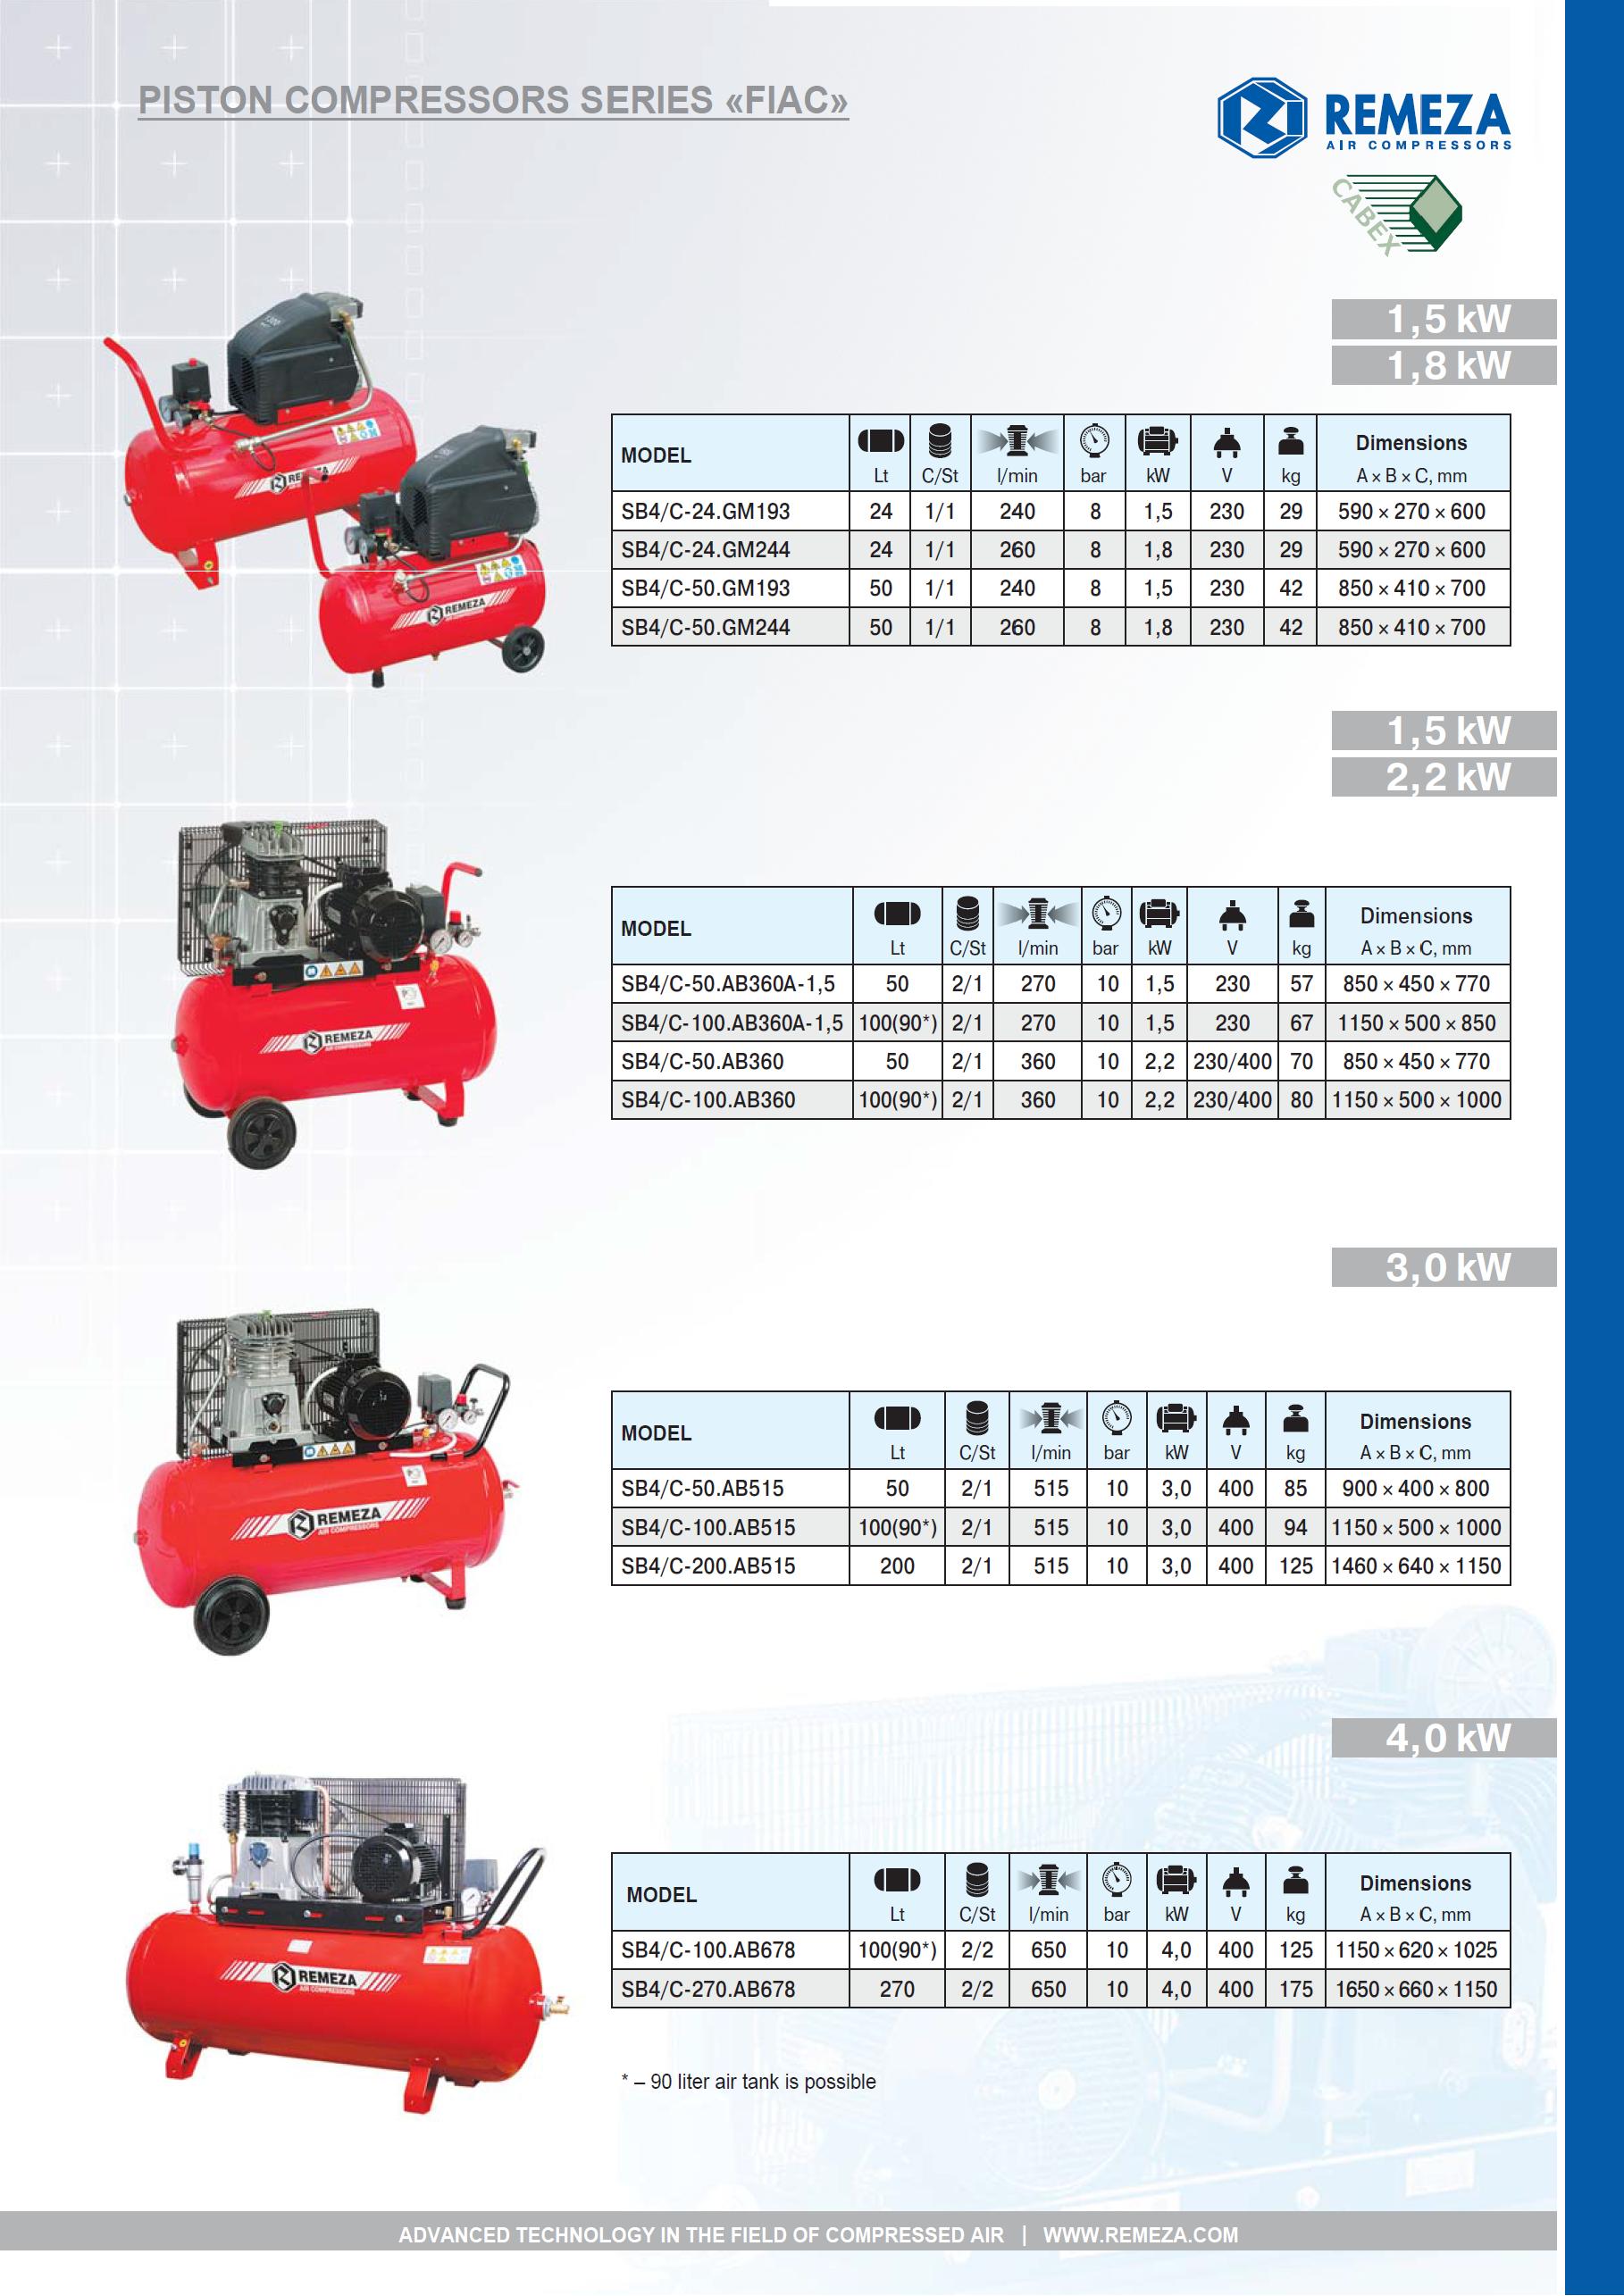 2_piston-compressors-fiac-series_pag_1